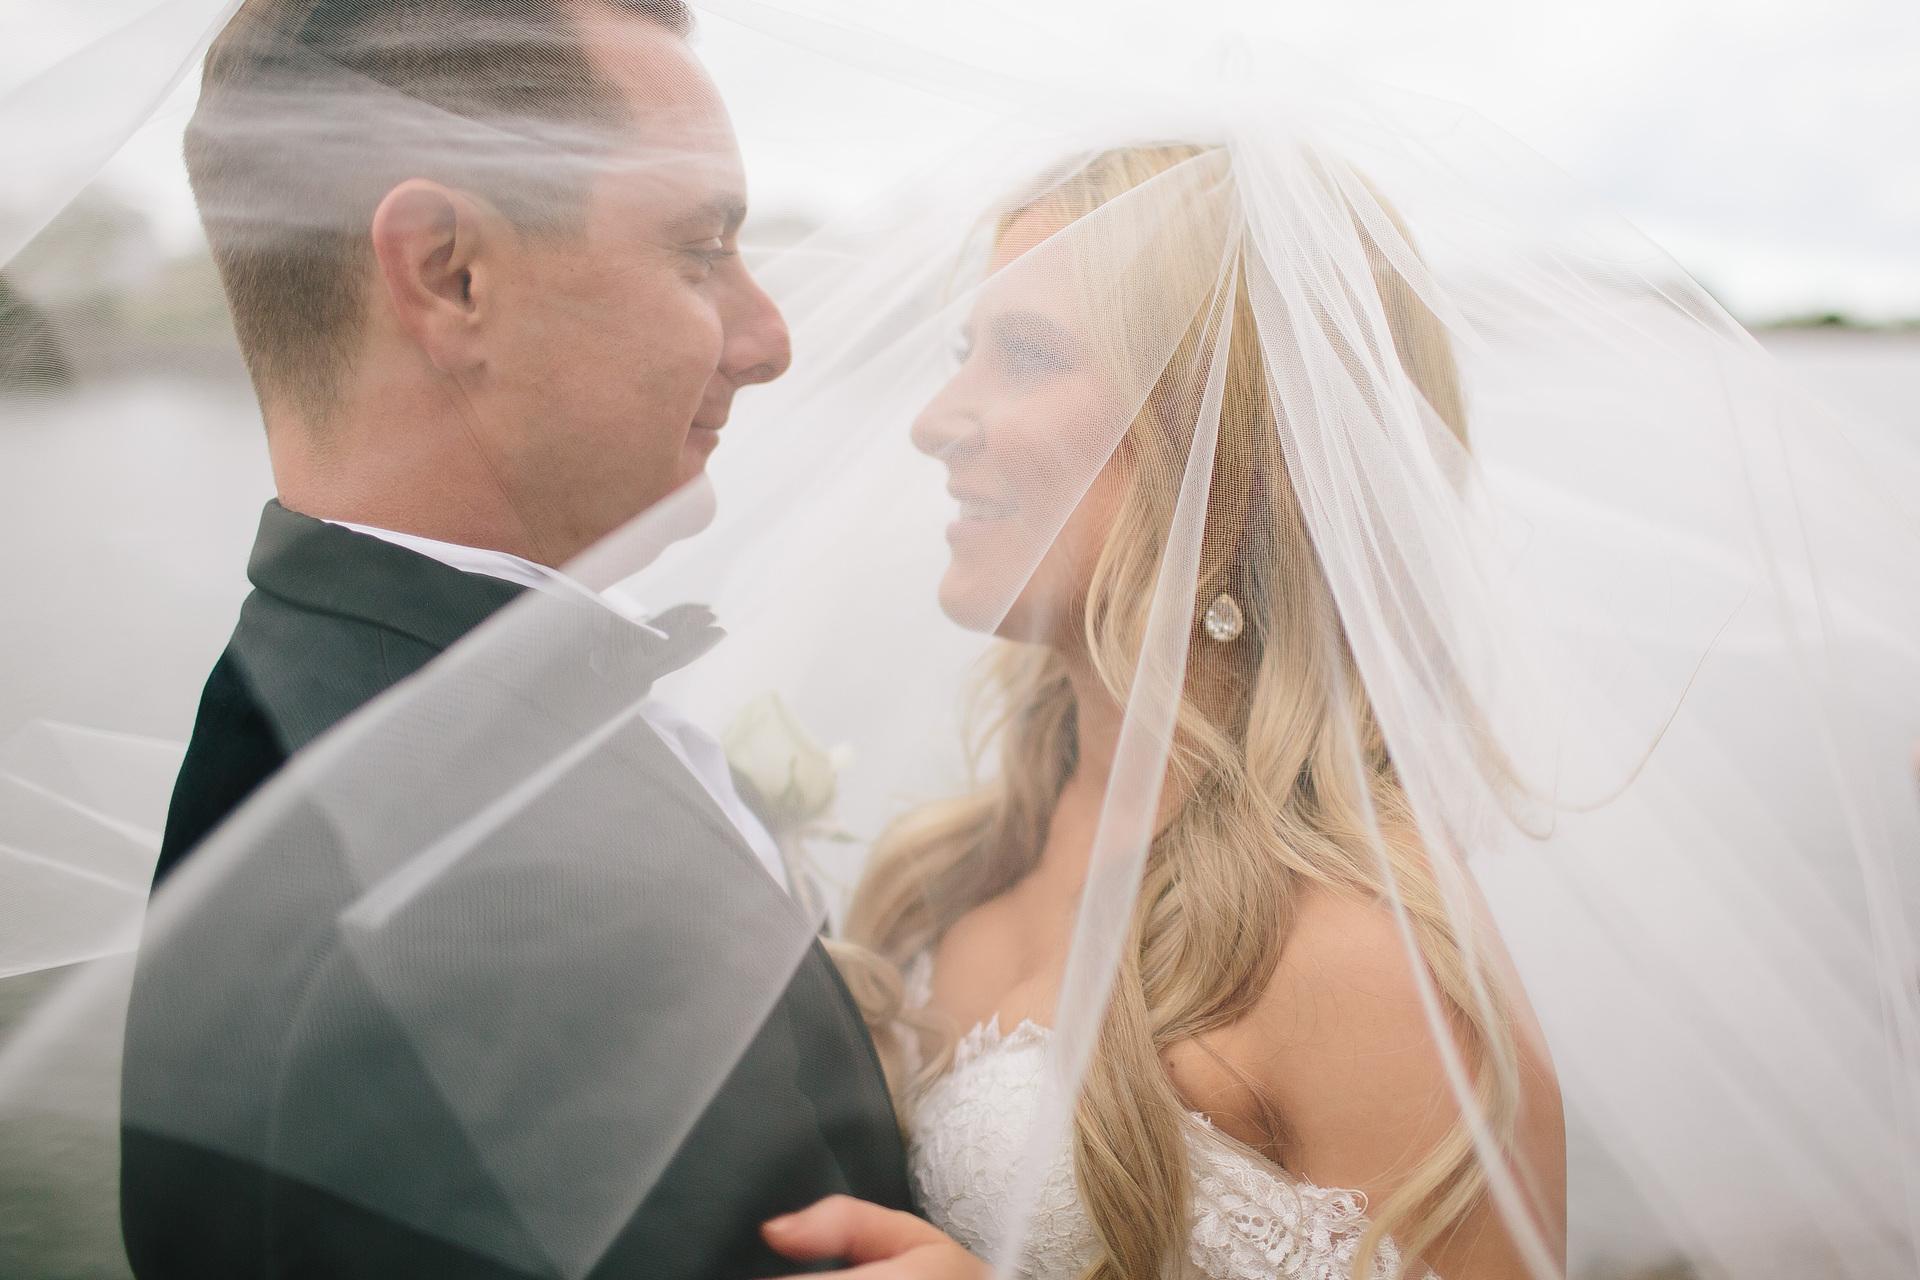 bride in veil with groom